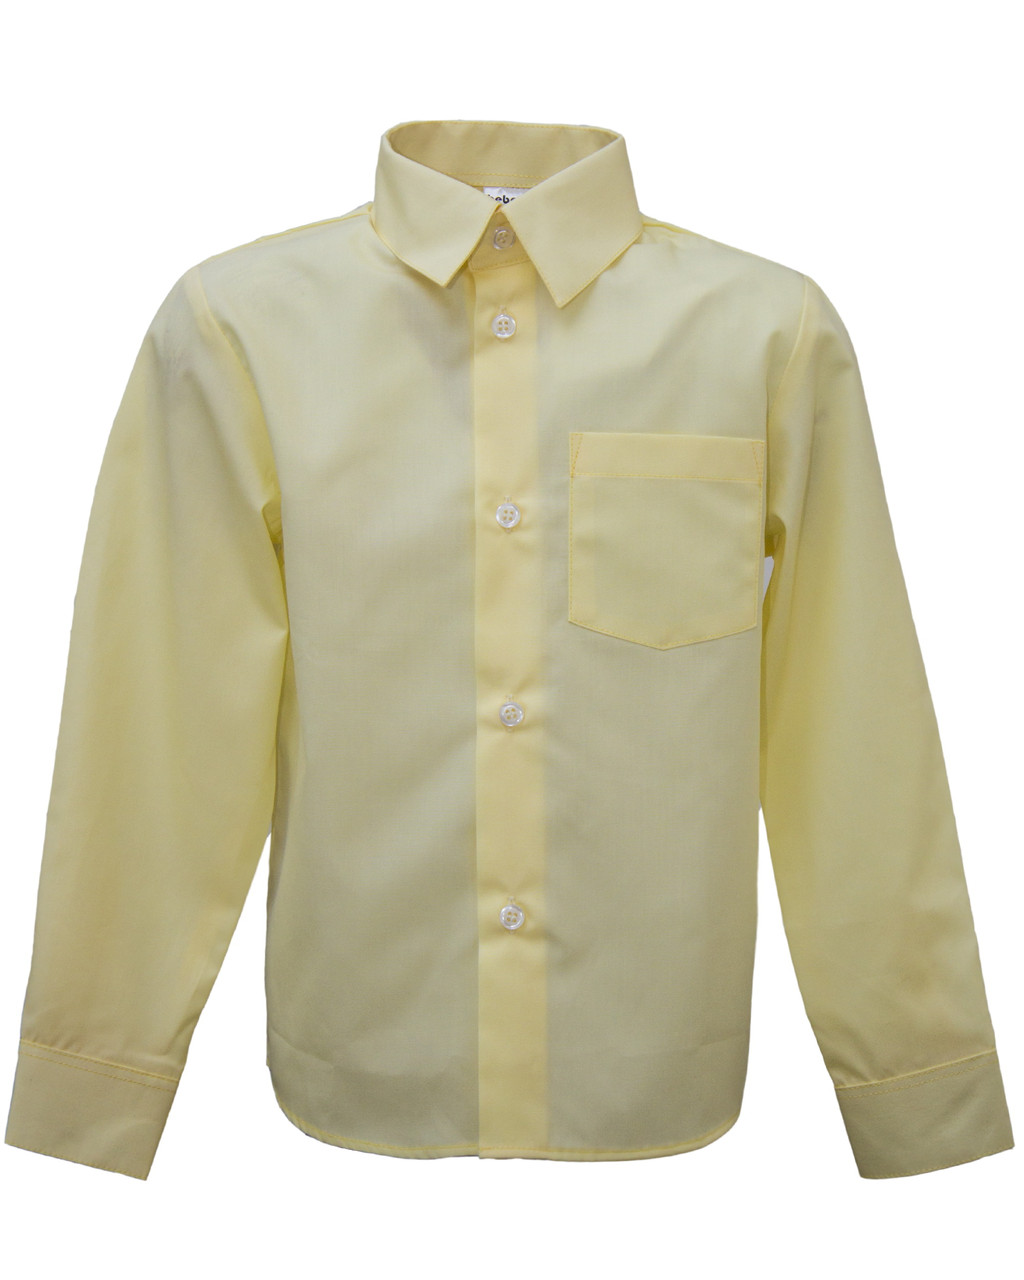 0ae951d981f2 Школьная рубашка для мальчика Желтая